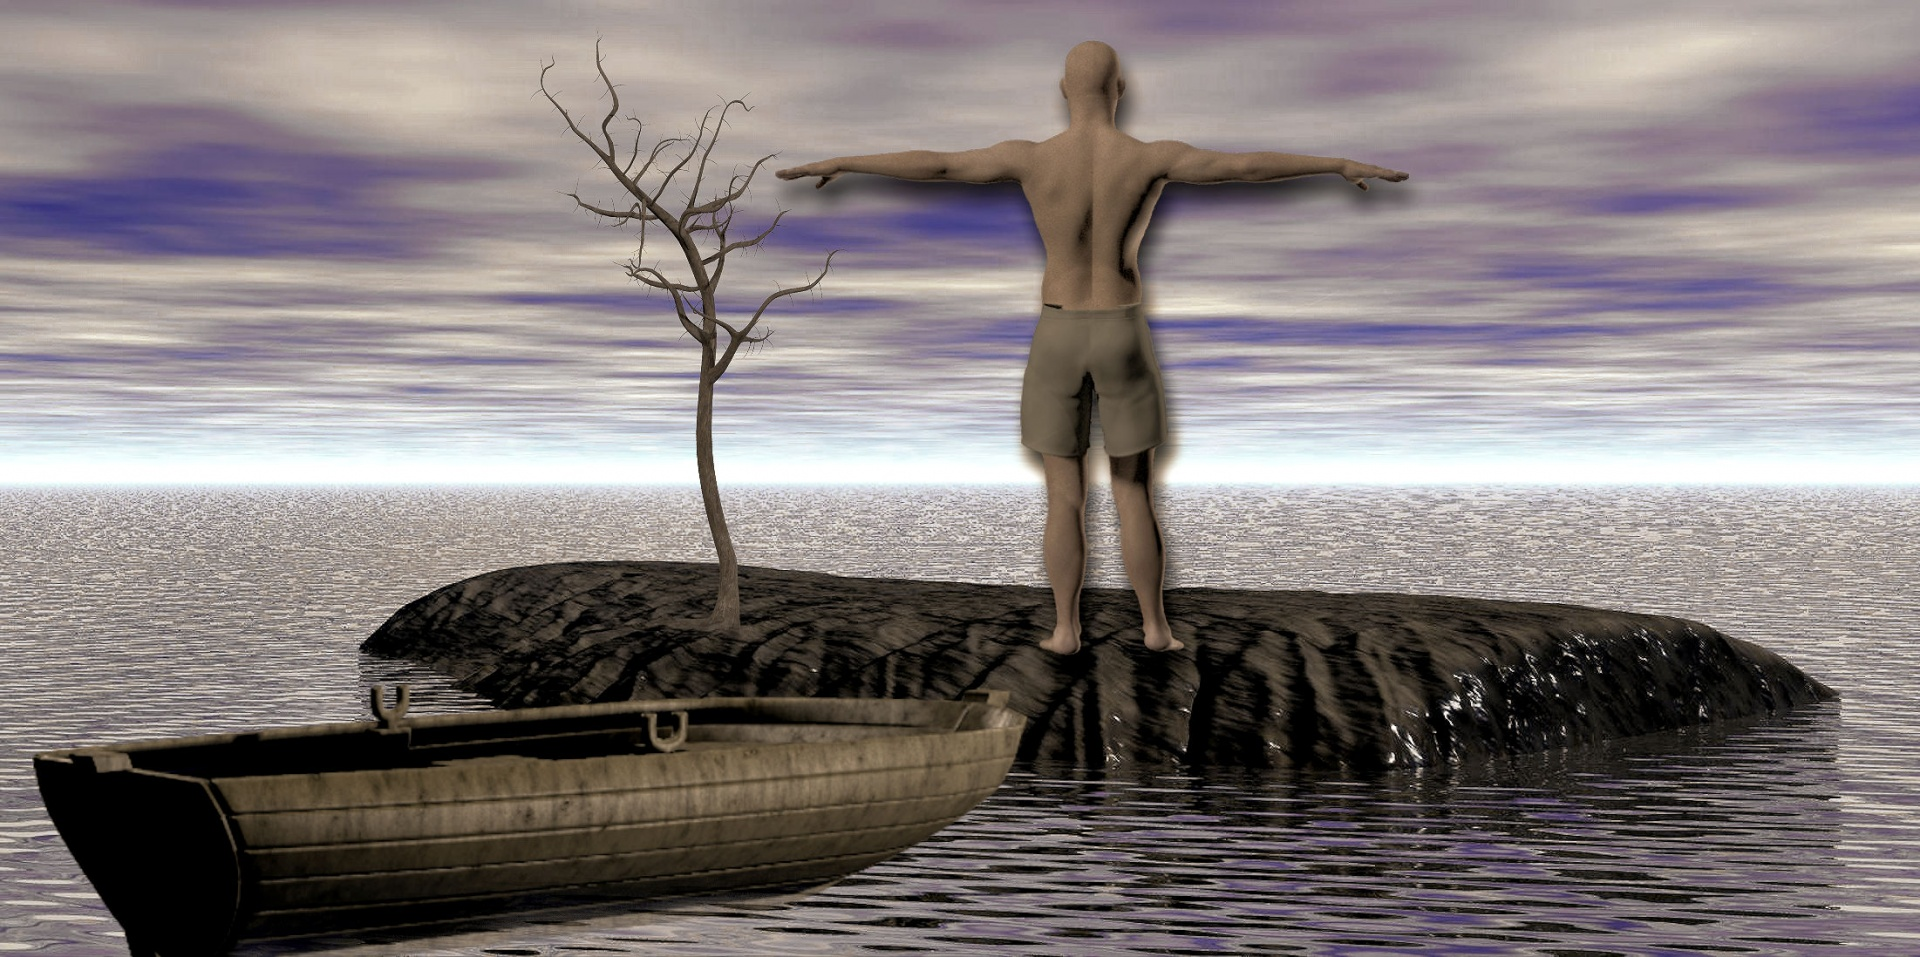 island, man on island, no man is an island, kai Stachowiak